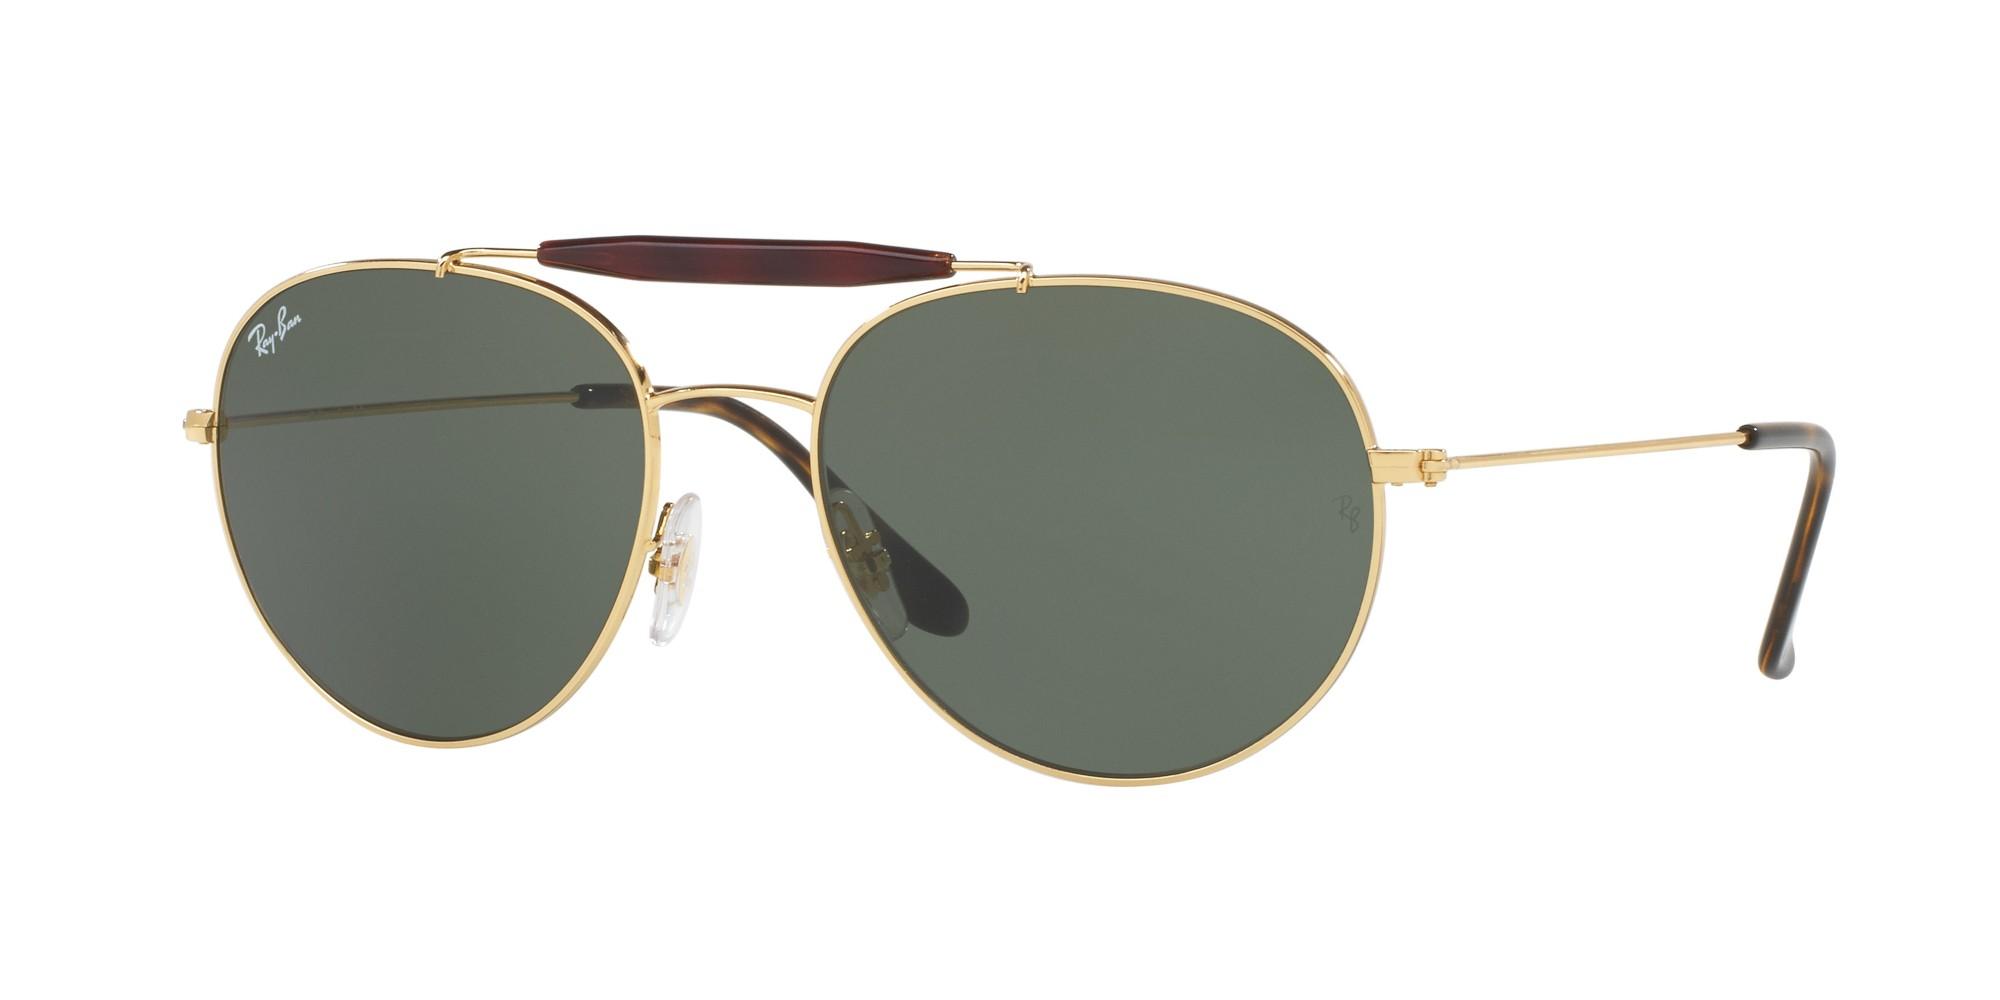 8eac10ccec982 Authentic Ray-Ban Rb3540 Prescription Sunglasses